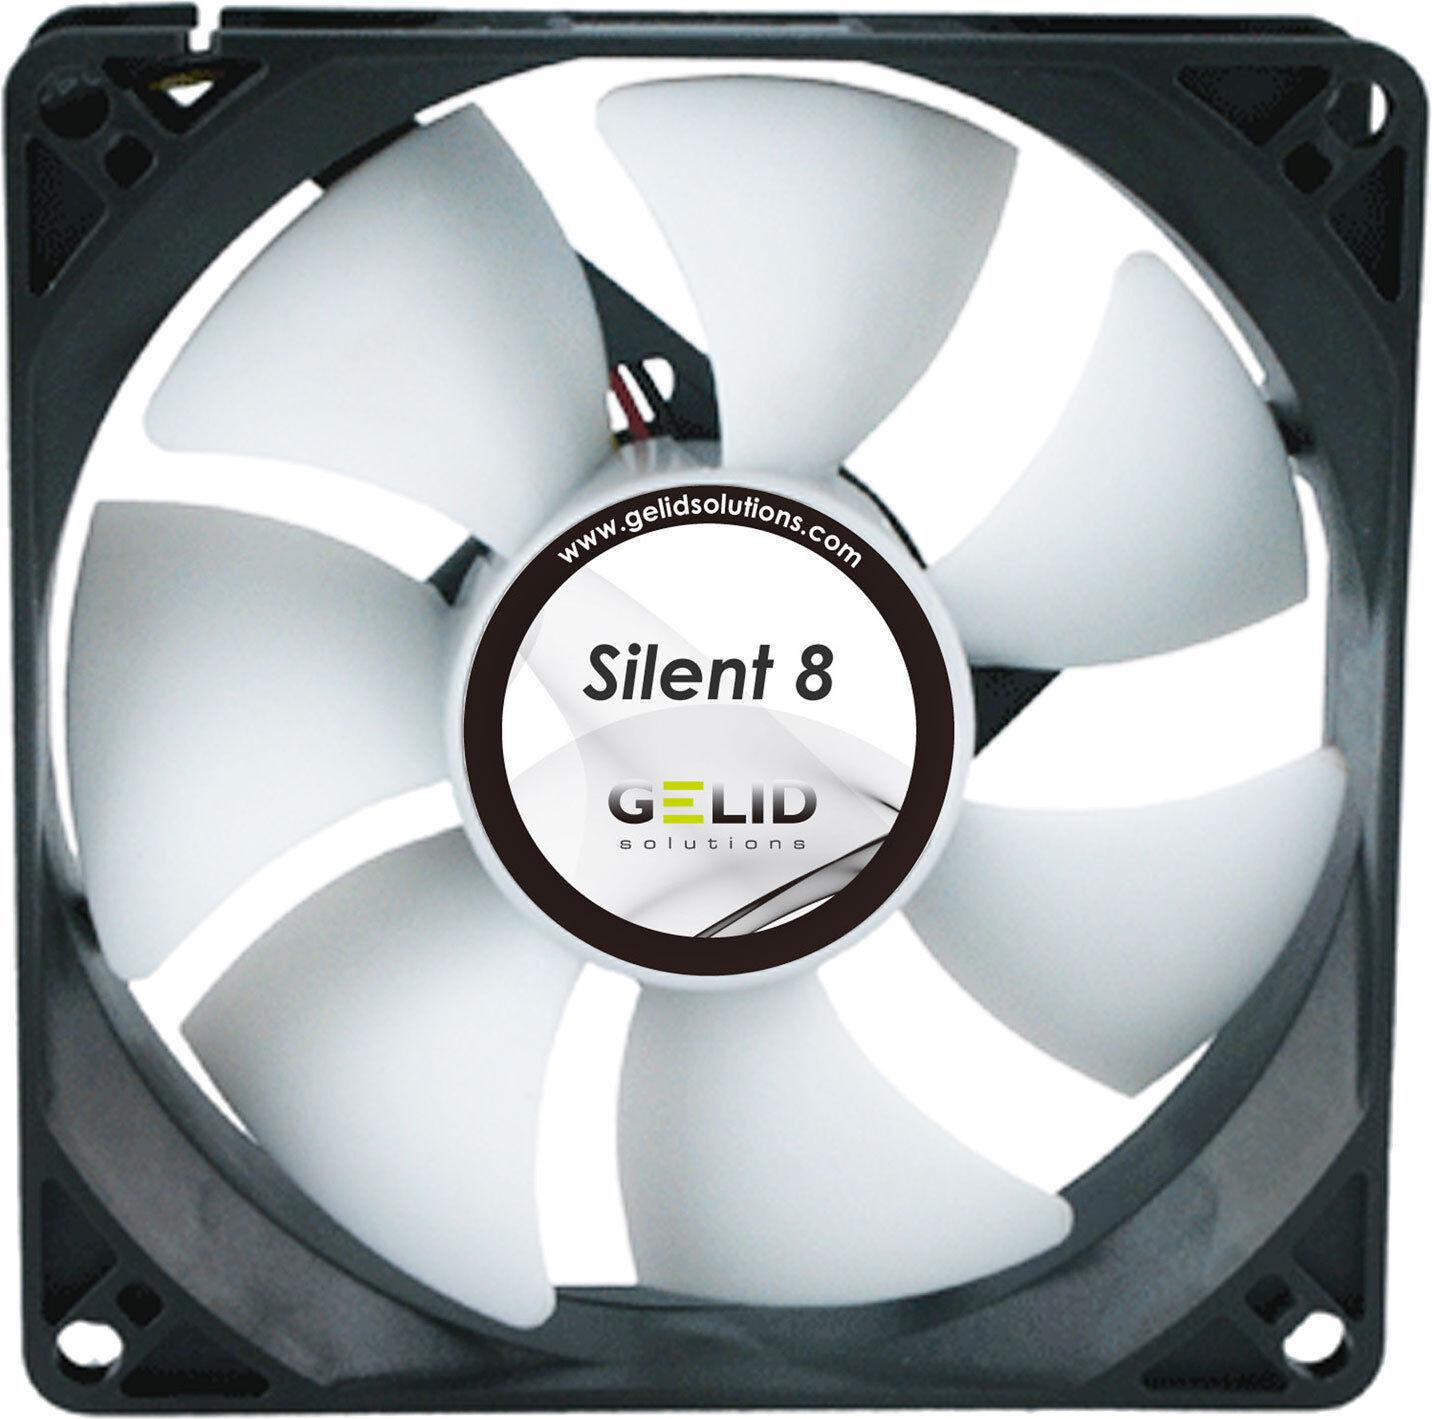 2 x Pack of Gelid Solutions Silent 8, Quiet Case Fan, 8cm, 80mm, 1600rpm